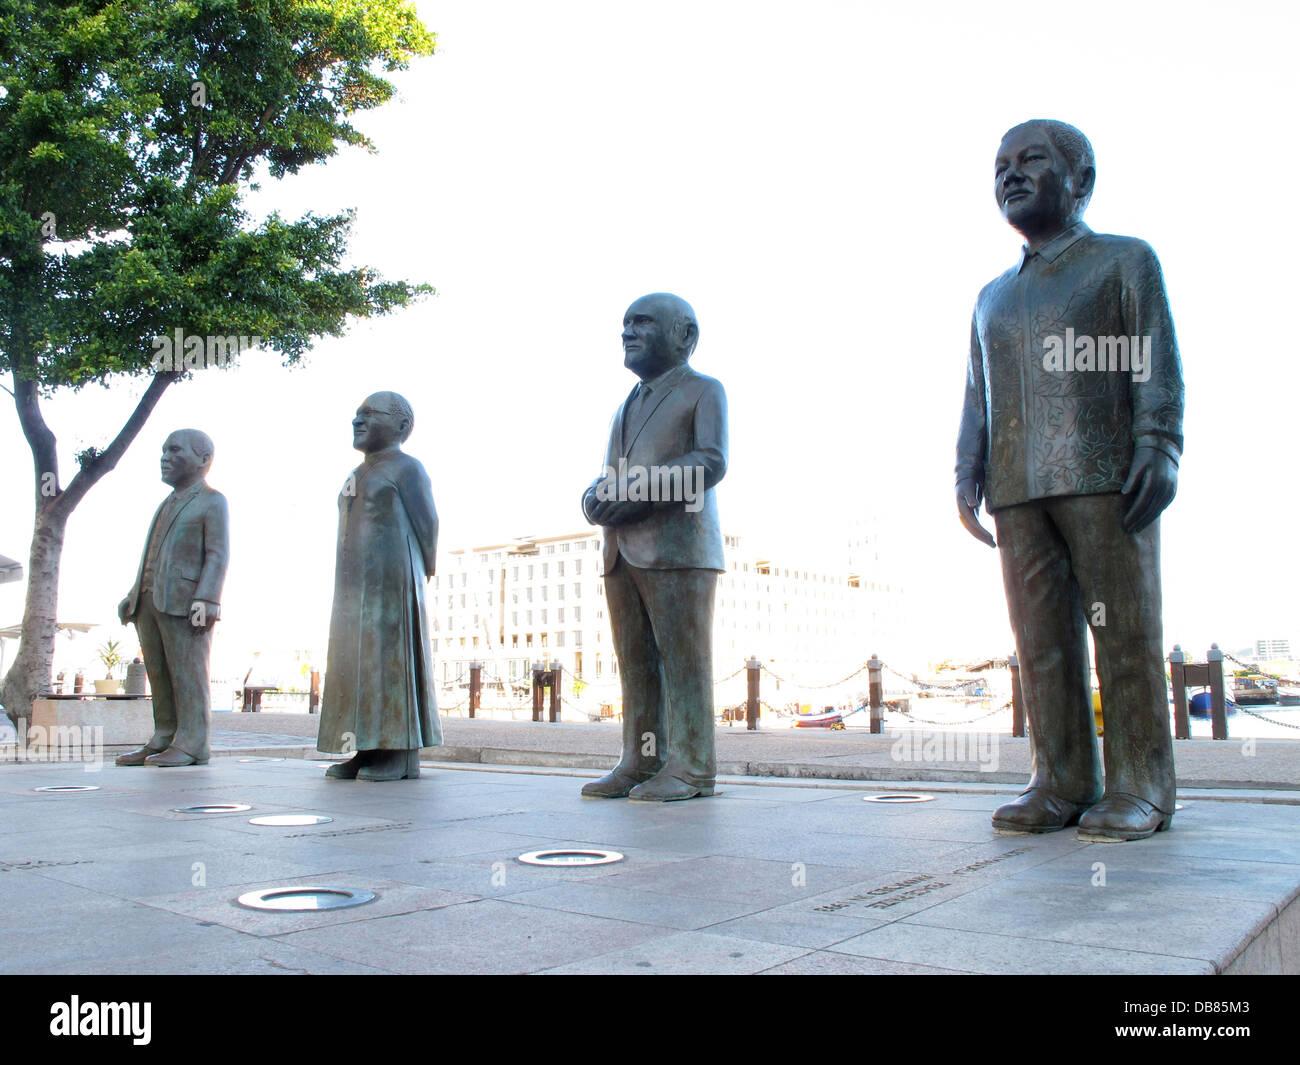 statues South African Nobel Peace Prize winners Albert Luthuli Desmond Tutu FW de Klerk Nelson Mandela Victoria - Stock Image